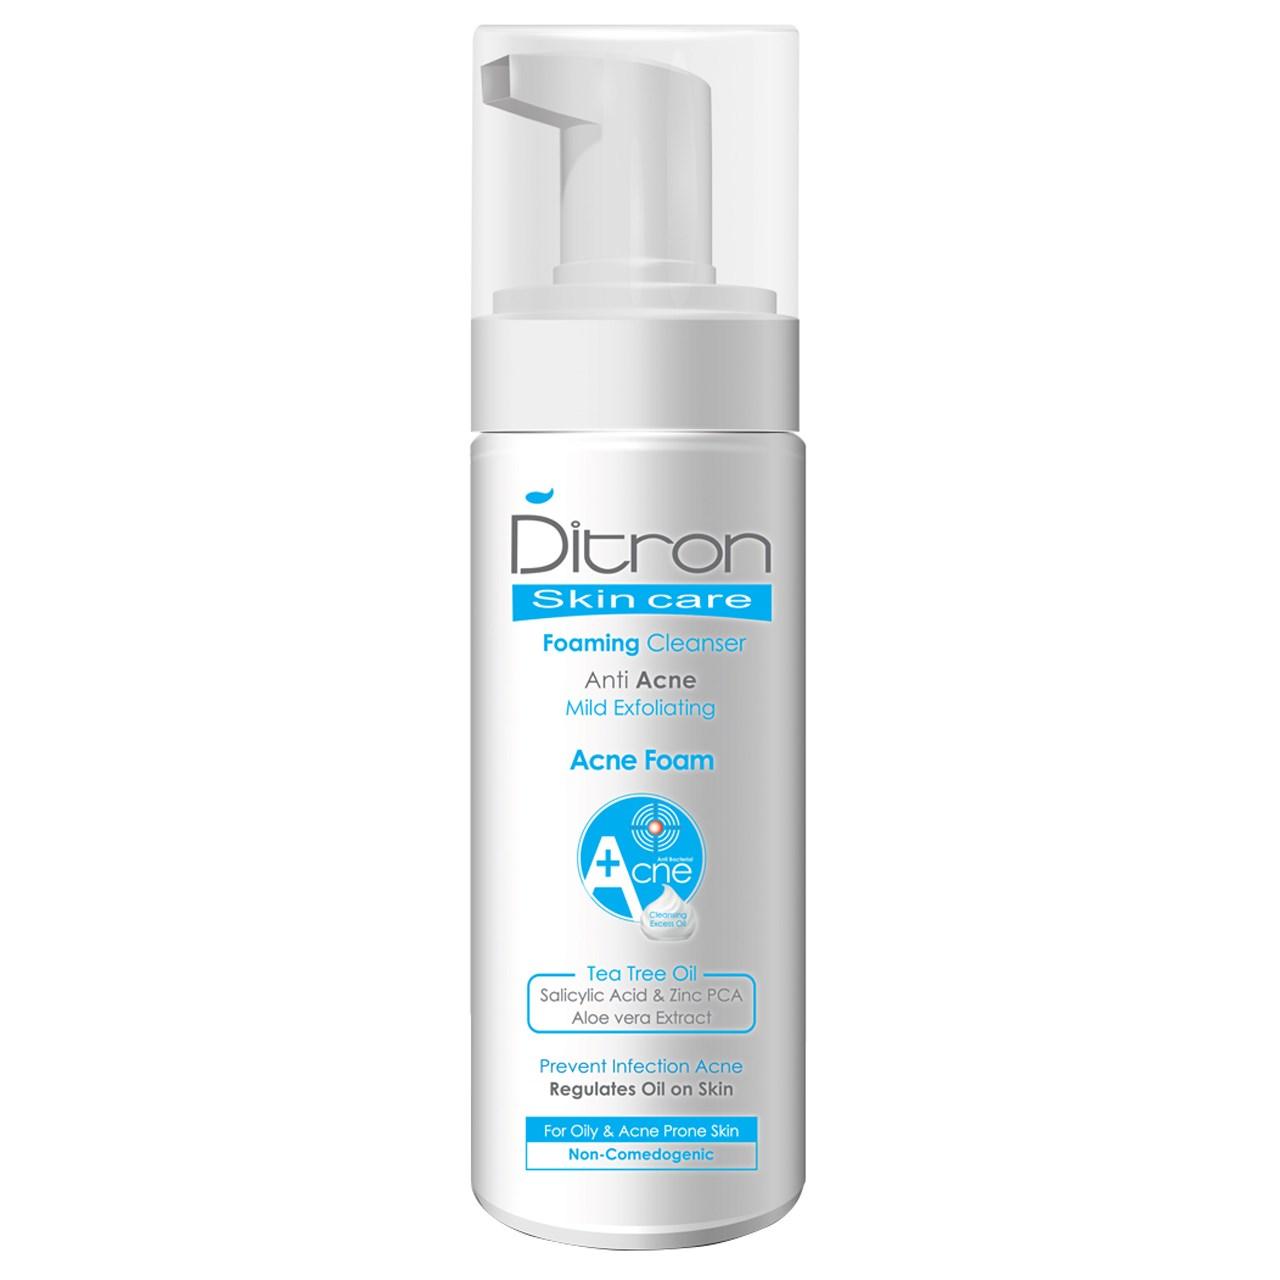 قیمت فوم شستشوی پوست دیترون مدل Anti Acne حجم 150 میلی لیتر